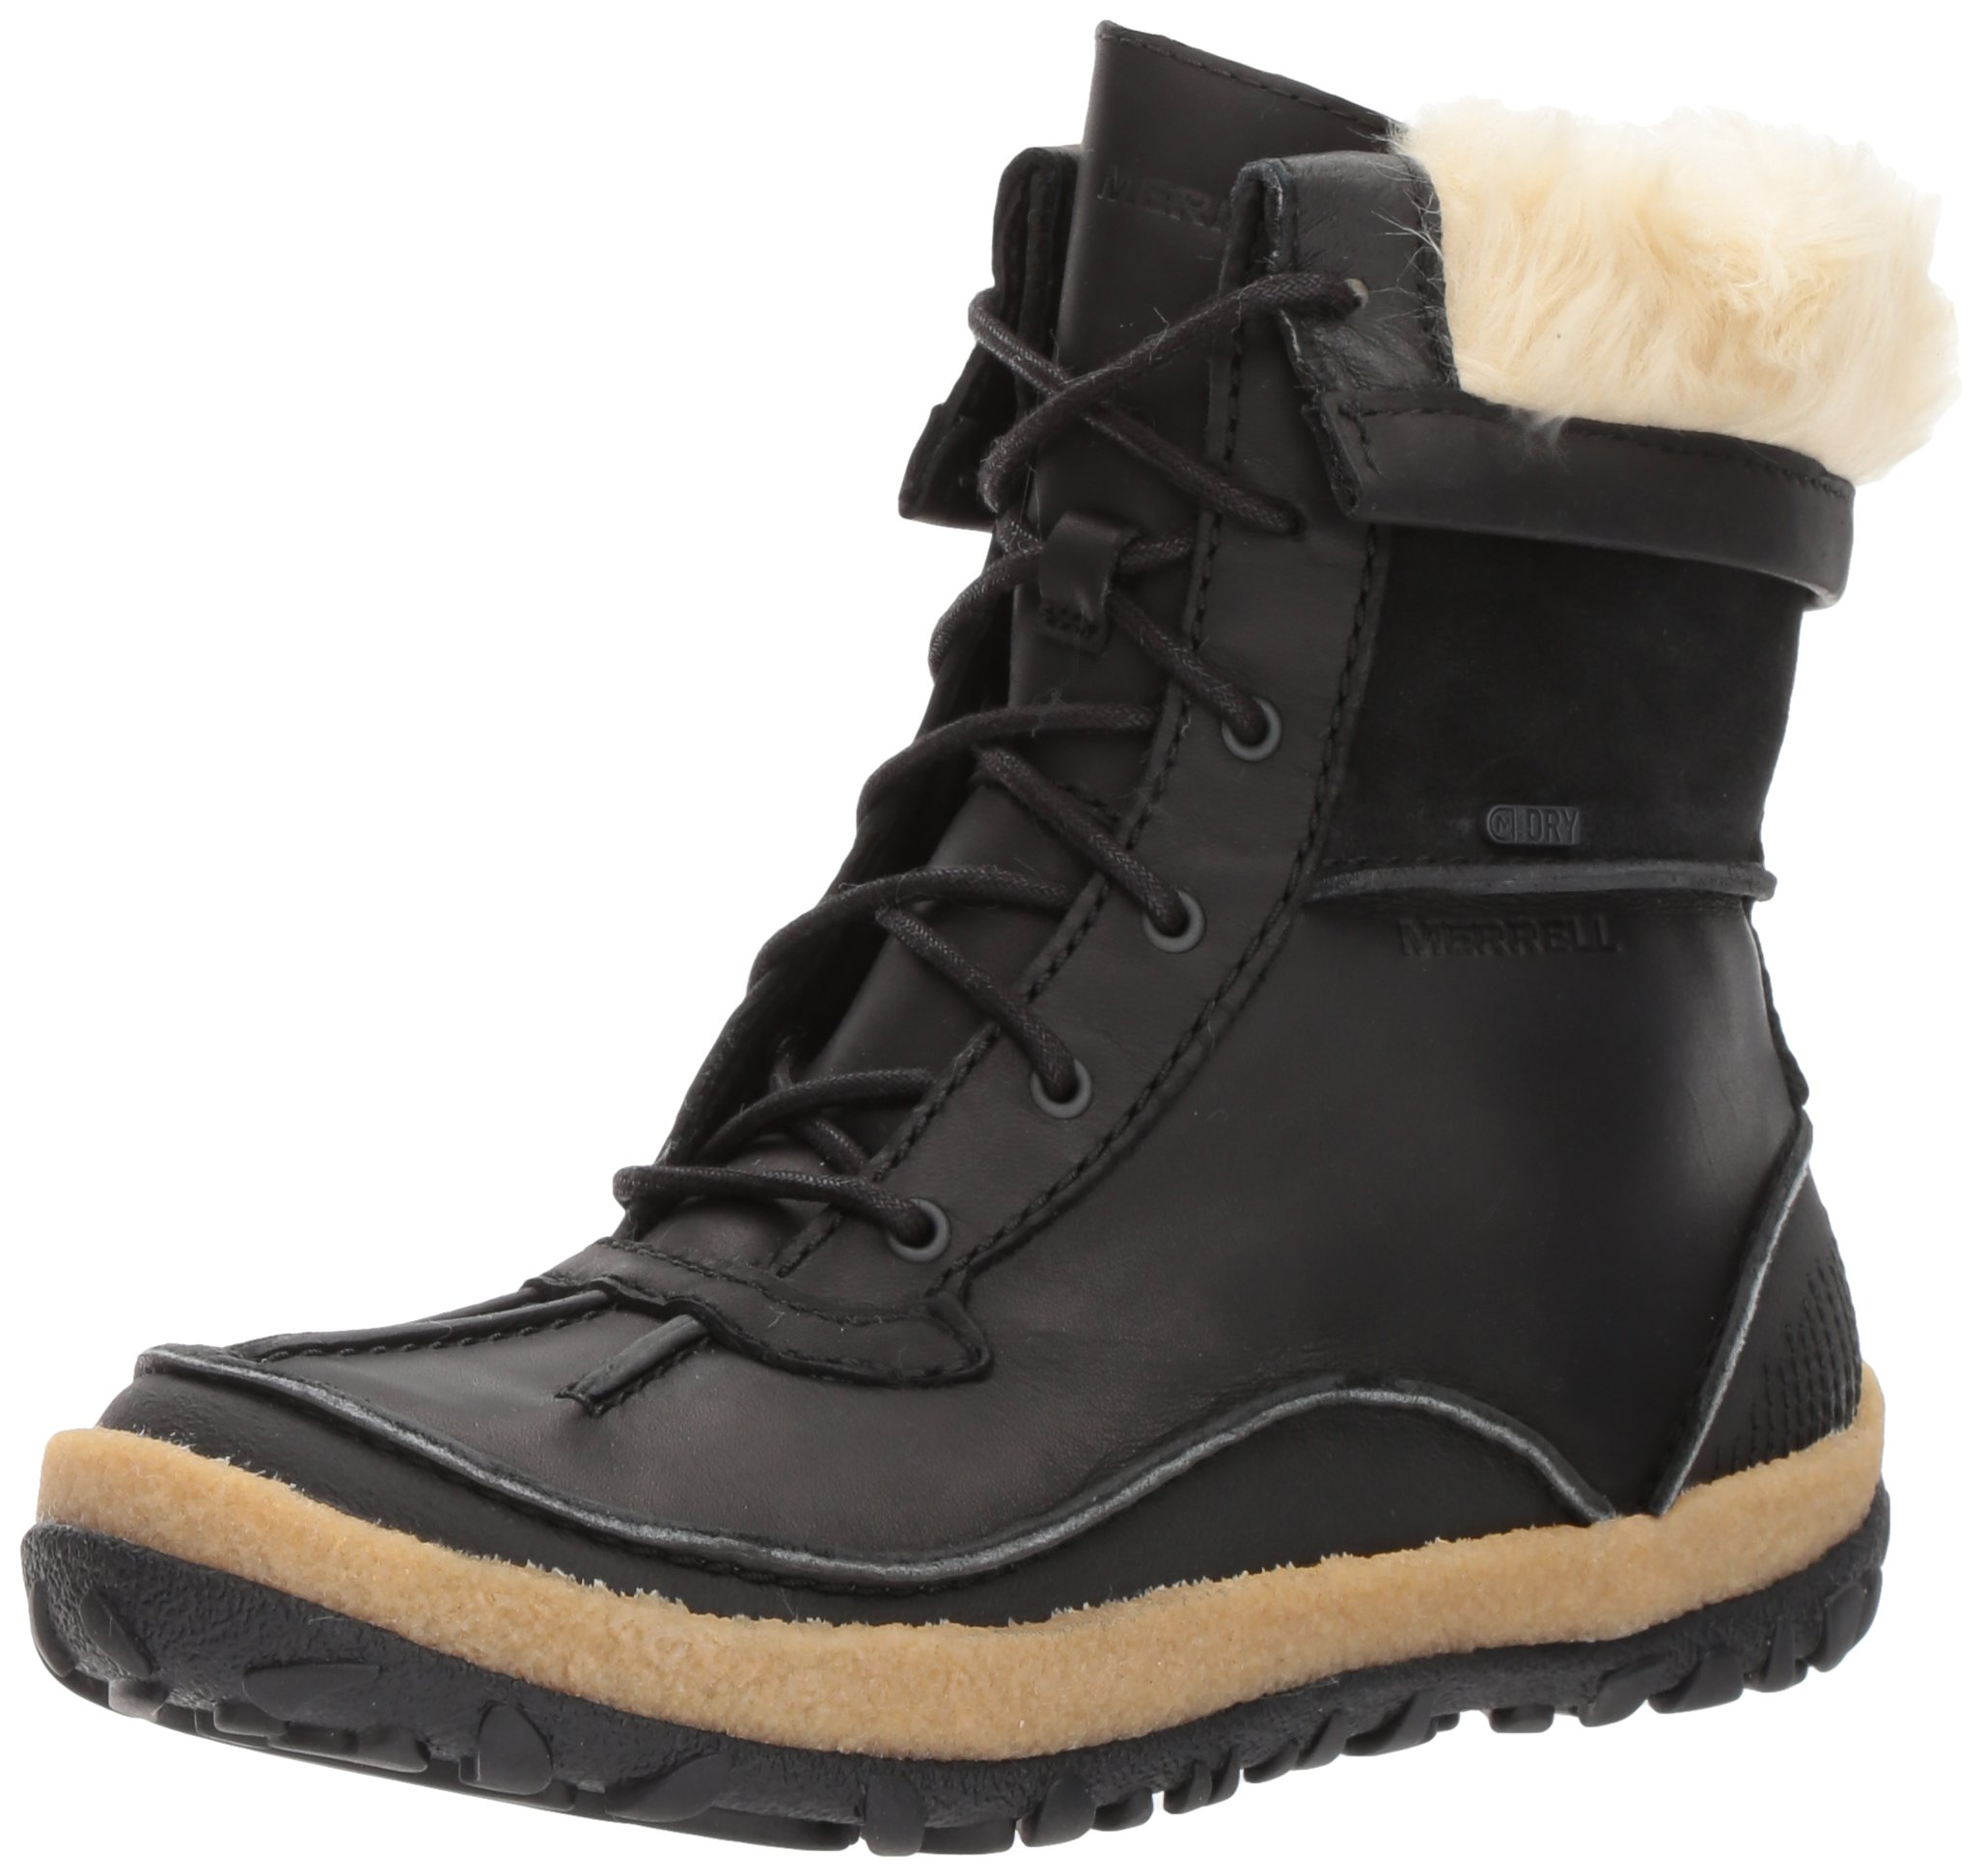 Merrell Women's Tremblant Mid Polar Waterproof Snow Boot, Black, 7 M US